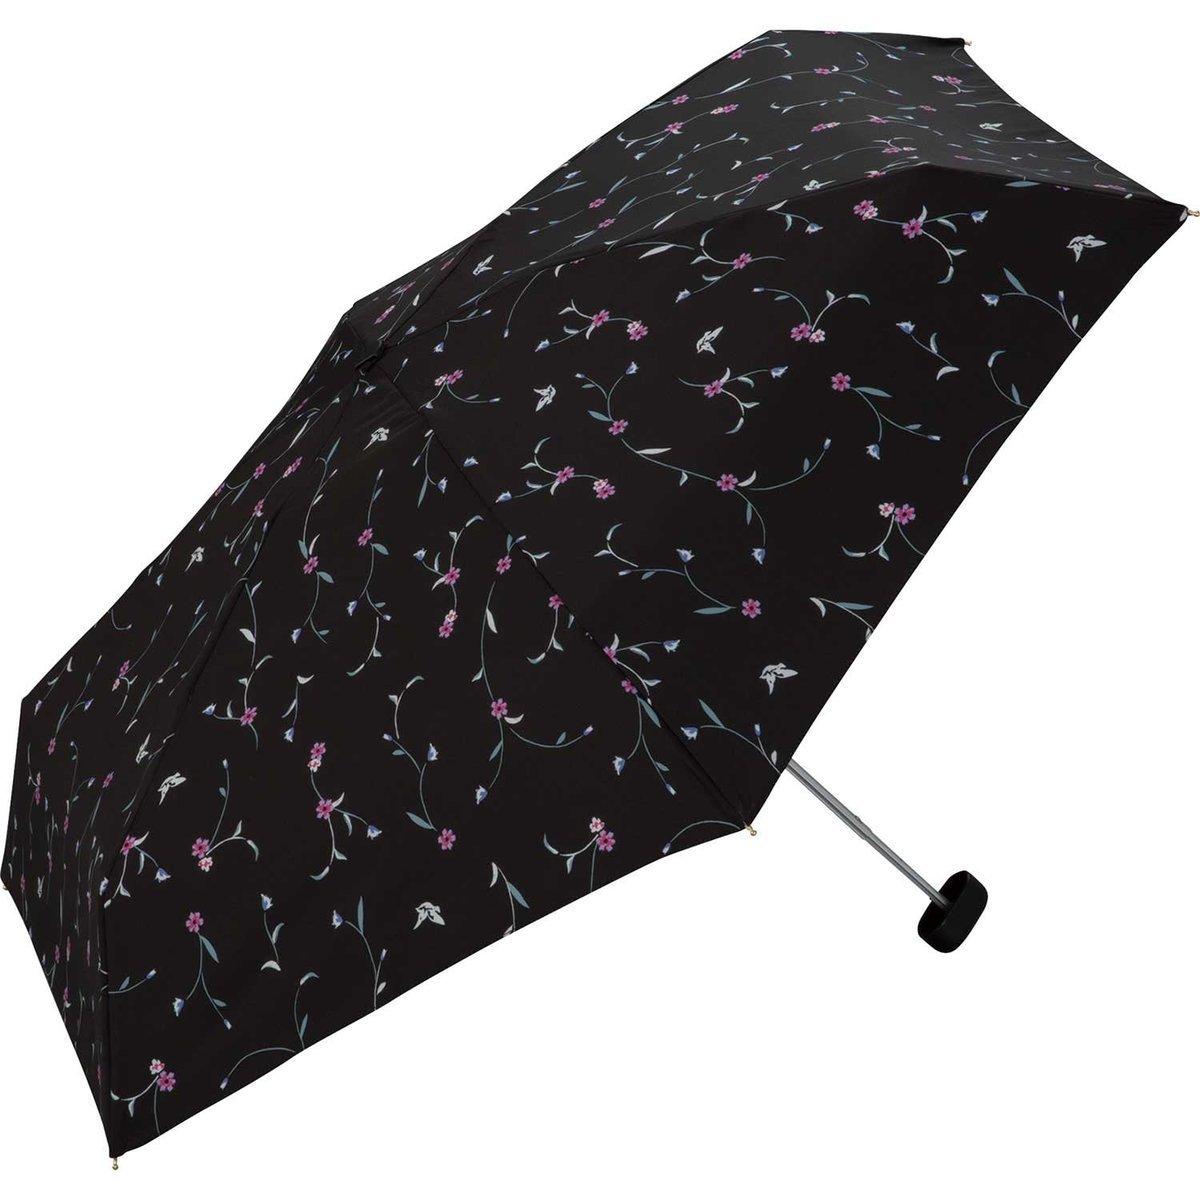 Mini Umbrella‧Anti-UV‧6076 Folding umbrella - Black